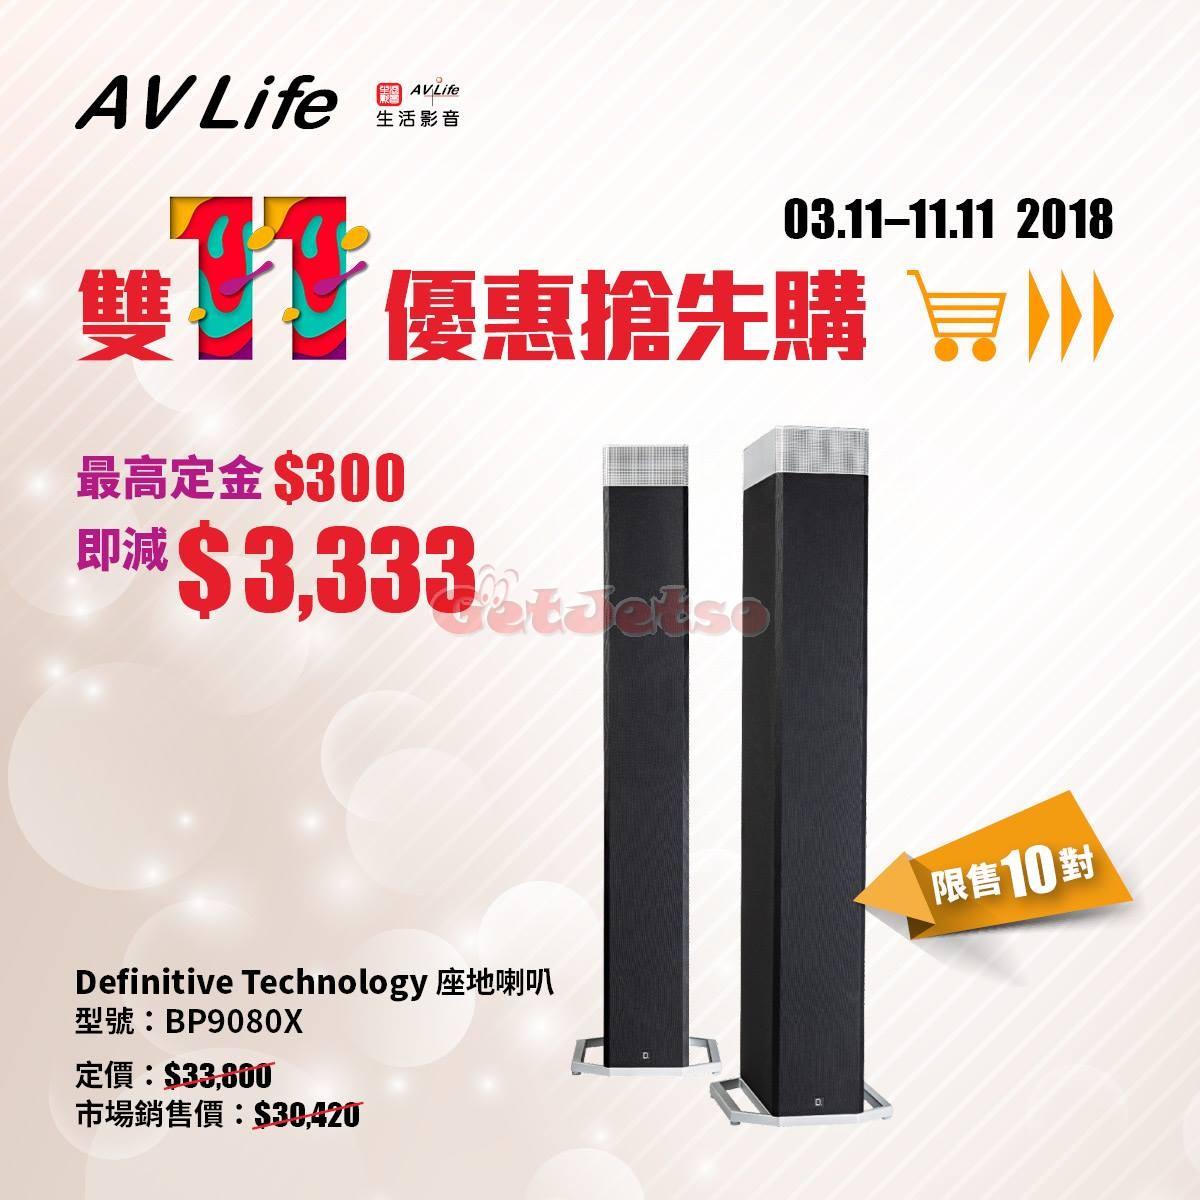 AV Life 生活影音低至25折店內優惠(11月5日更新)